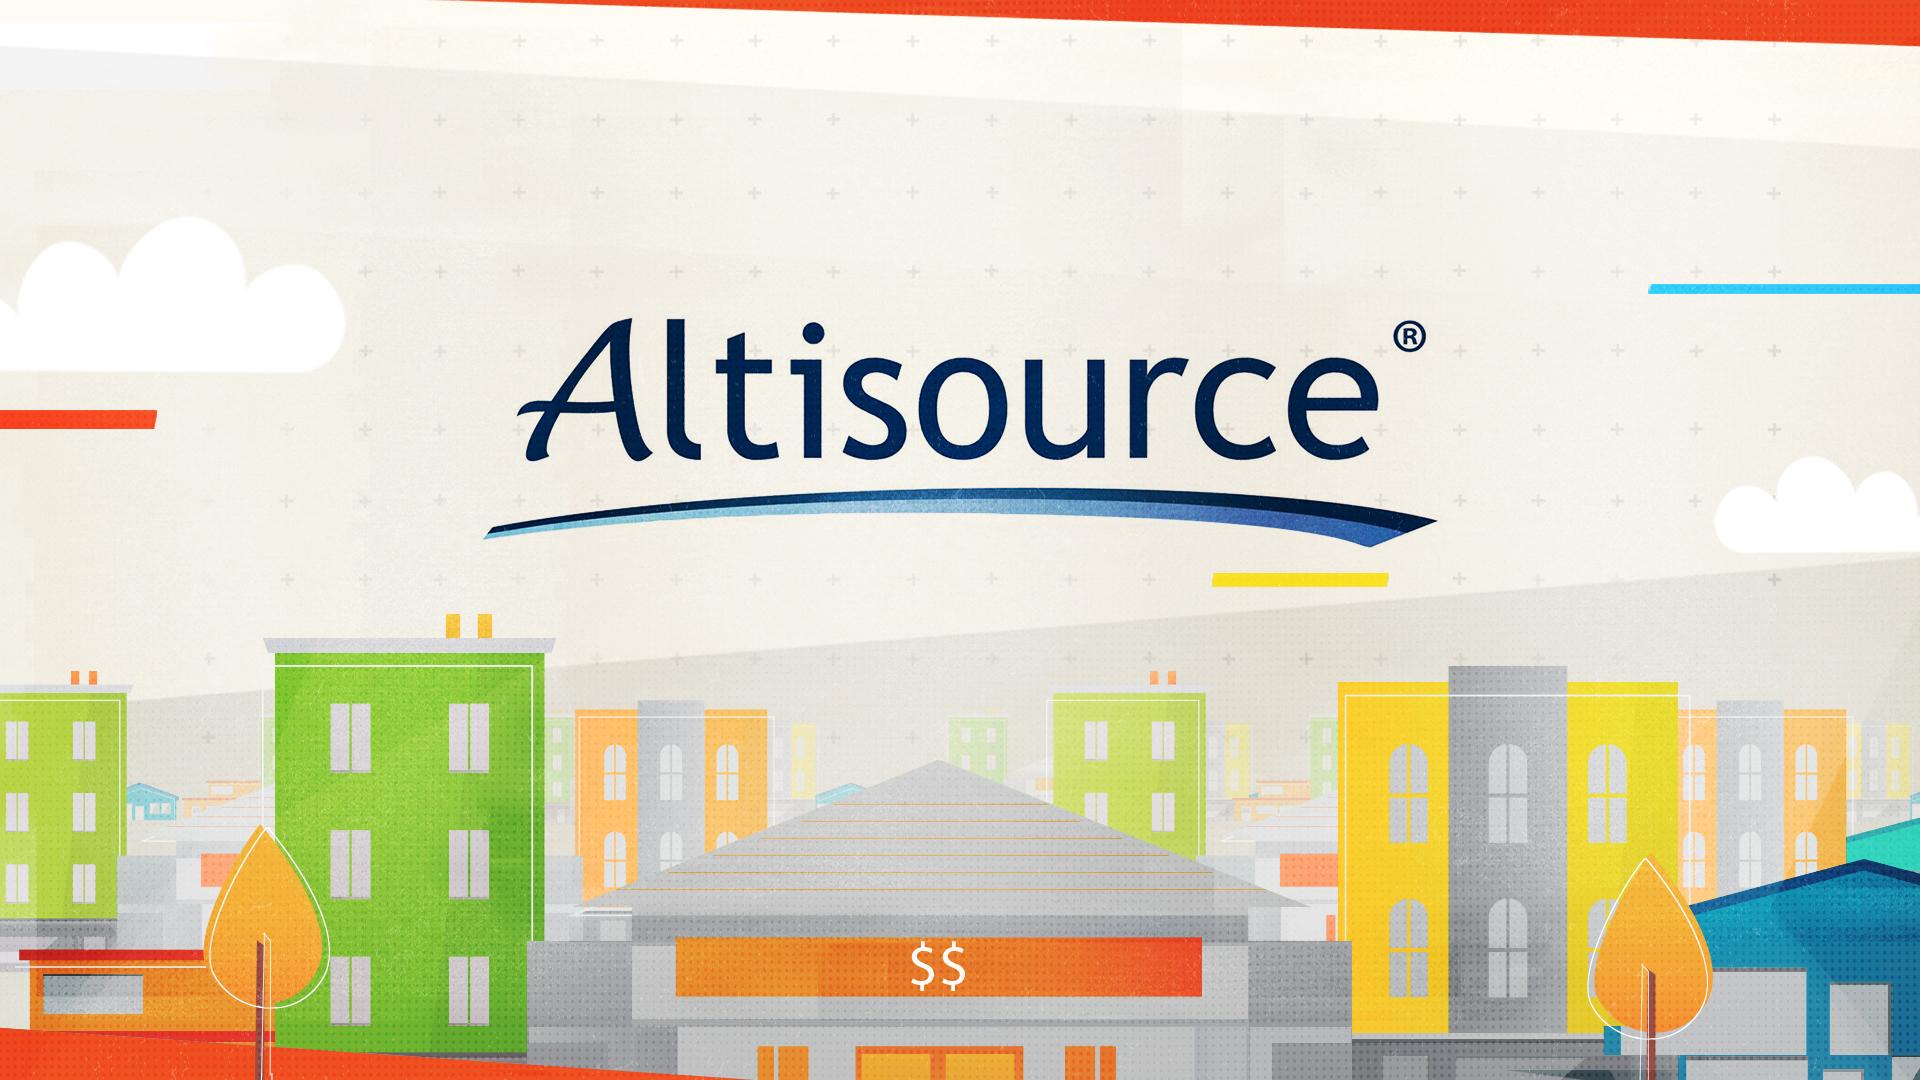 AltSource_16.jpg